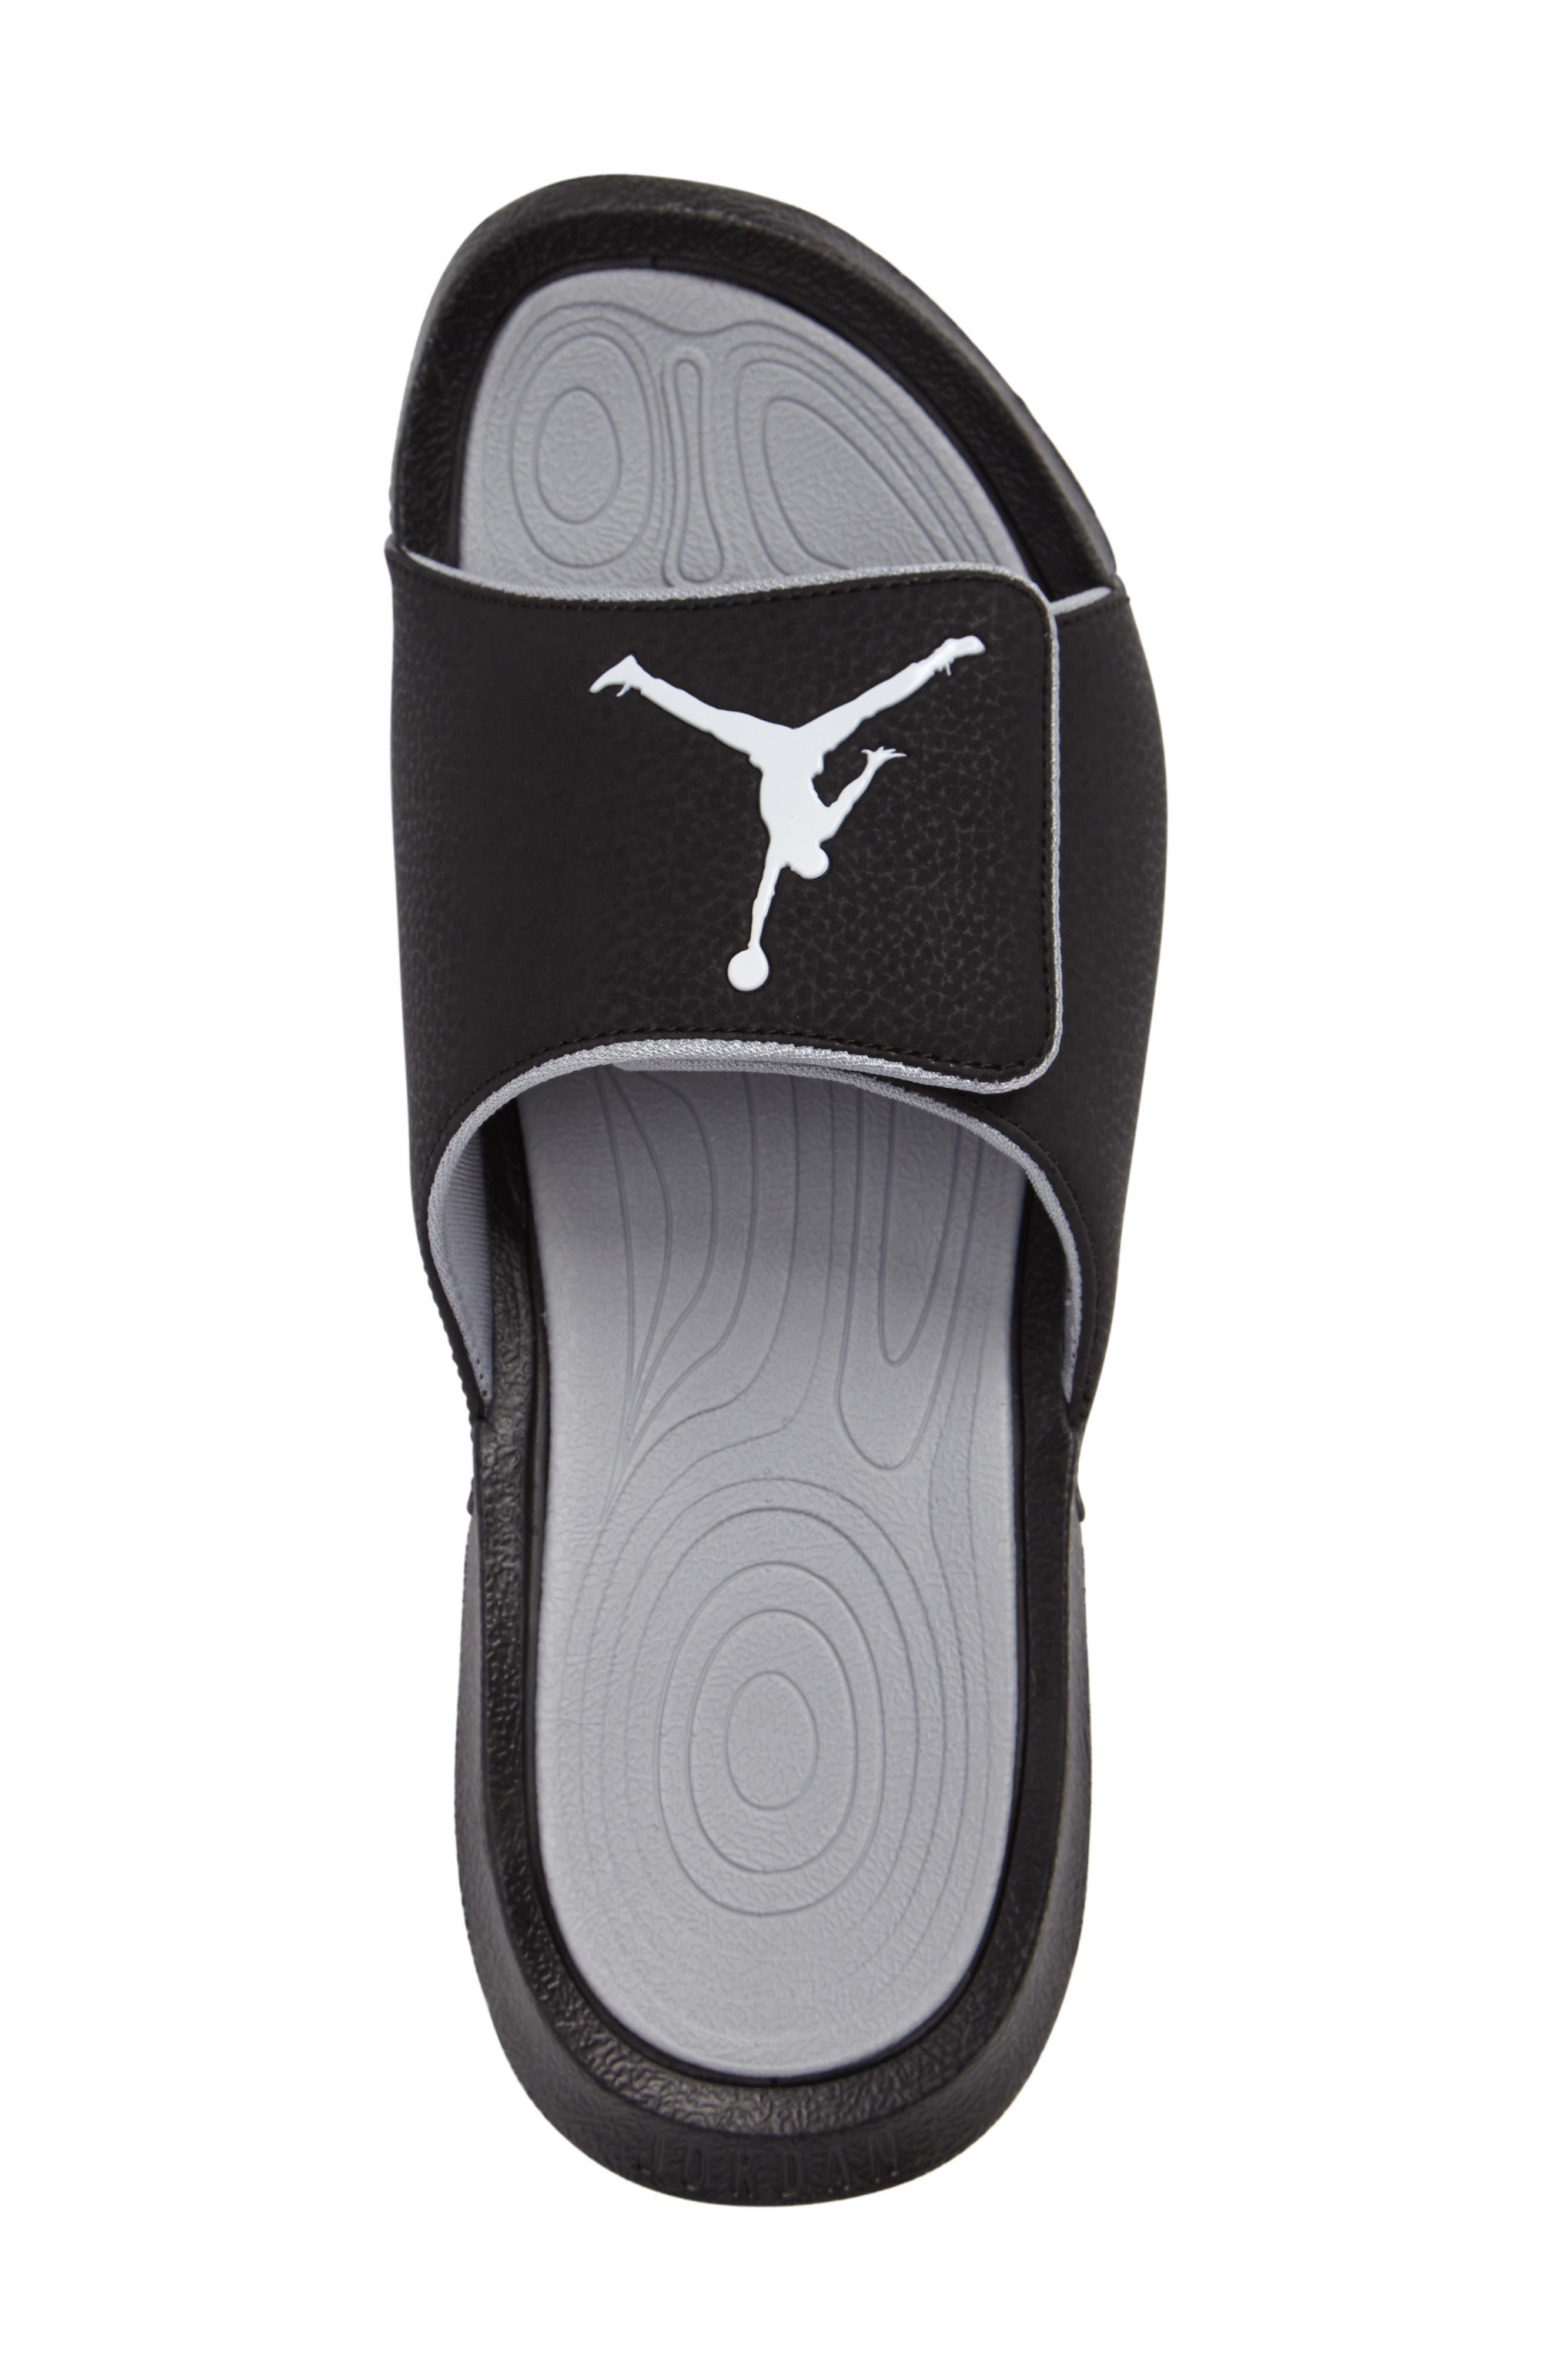 NIKE,                             Jordan Hydro 6 Slide Sandal,                             Alternate thumbnail 3, color,                             011